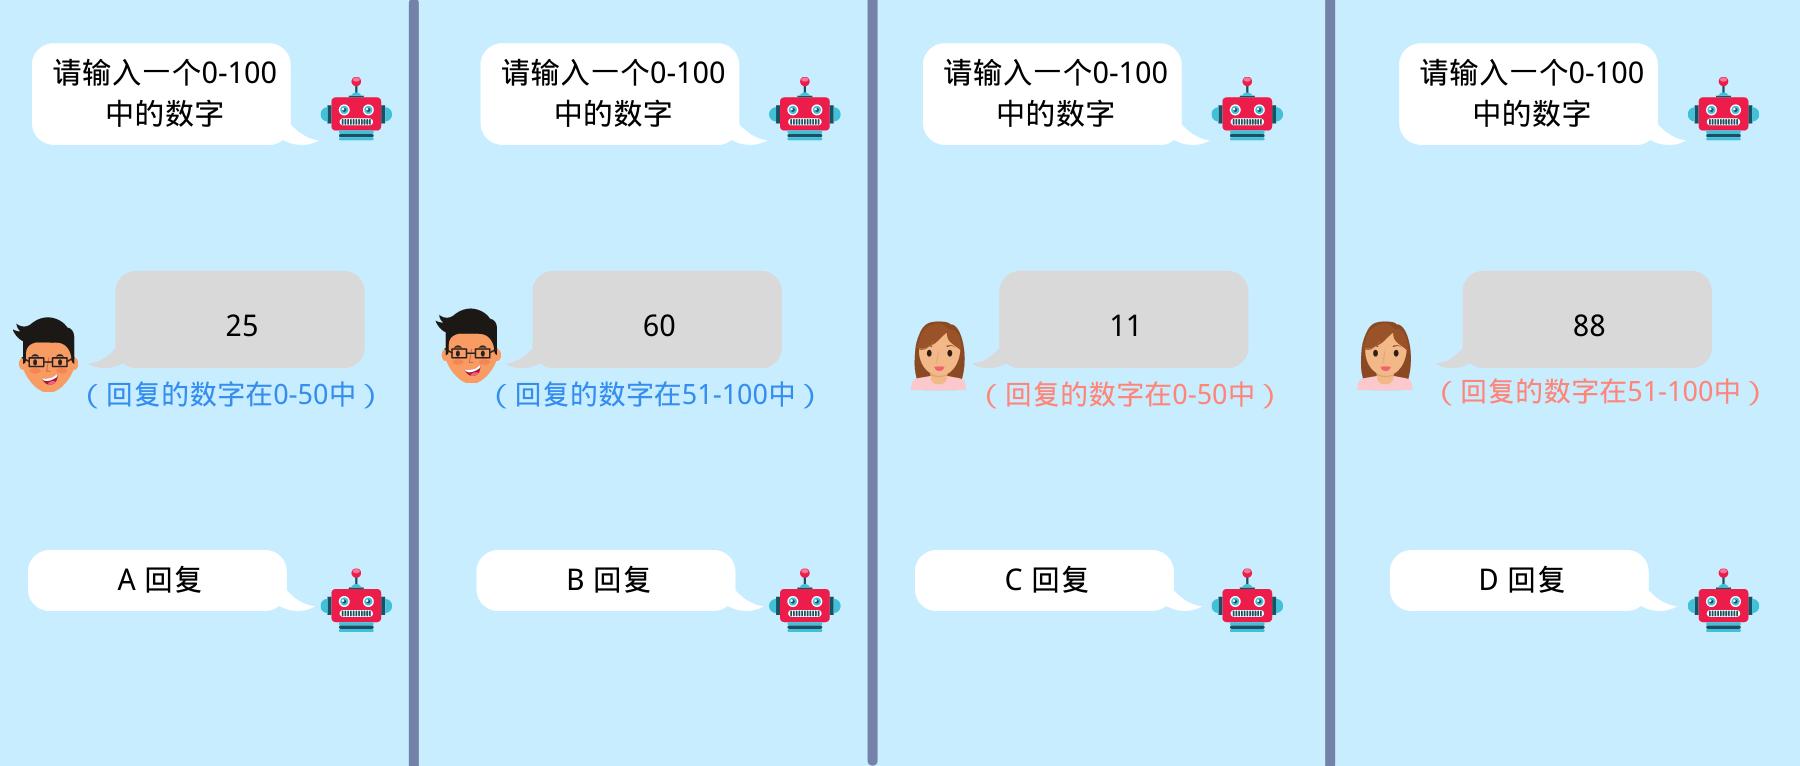 Manychat独立站跨境电商入门教程